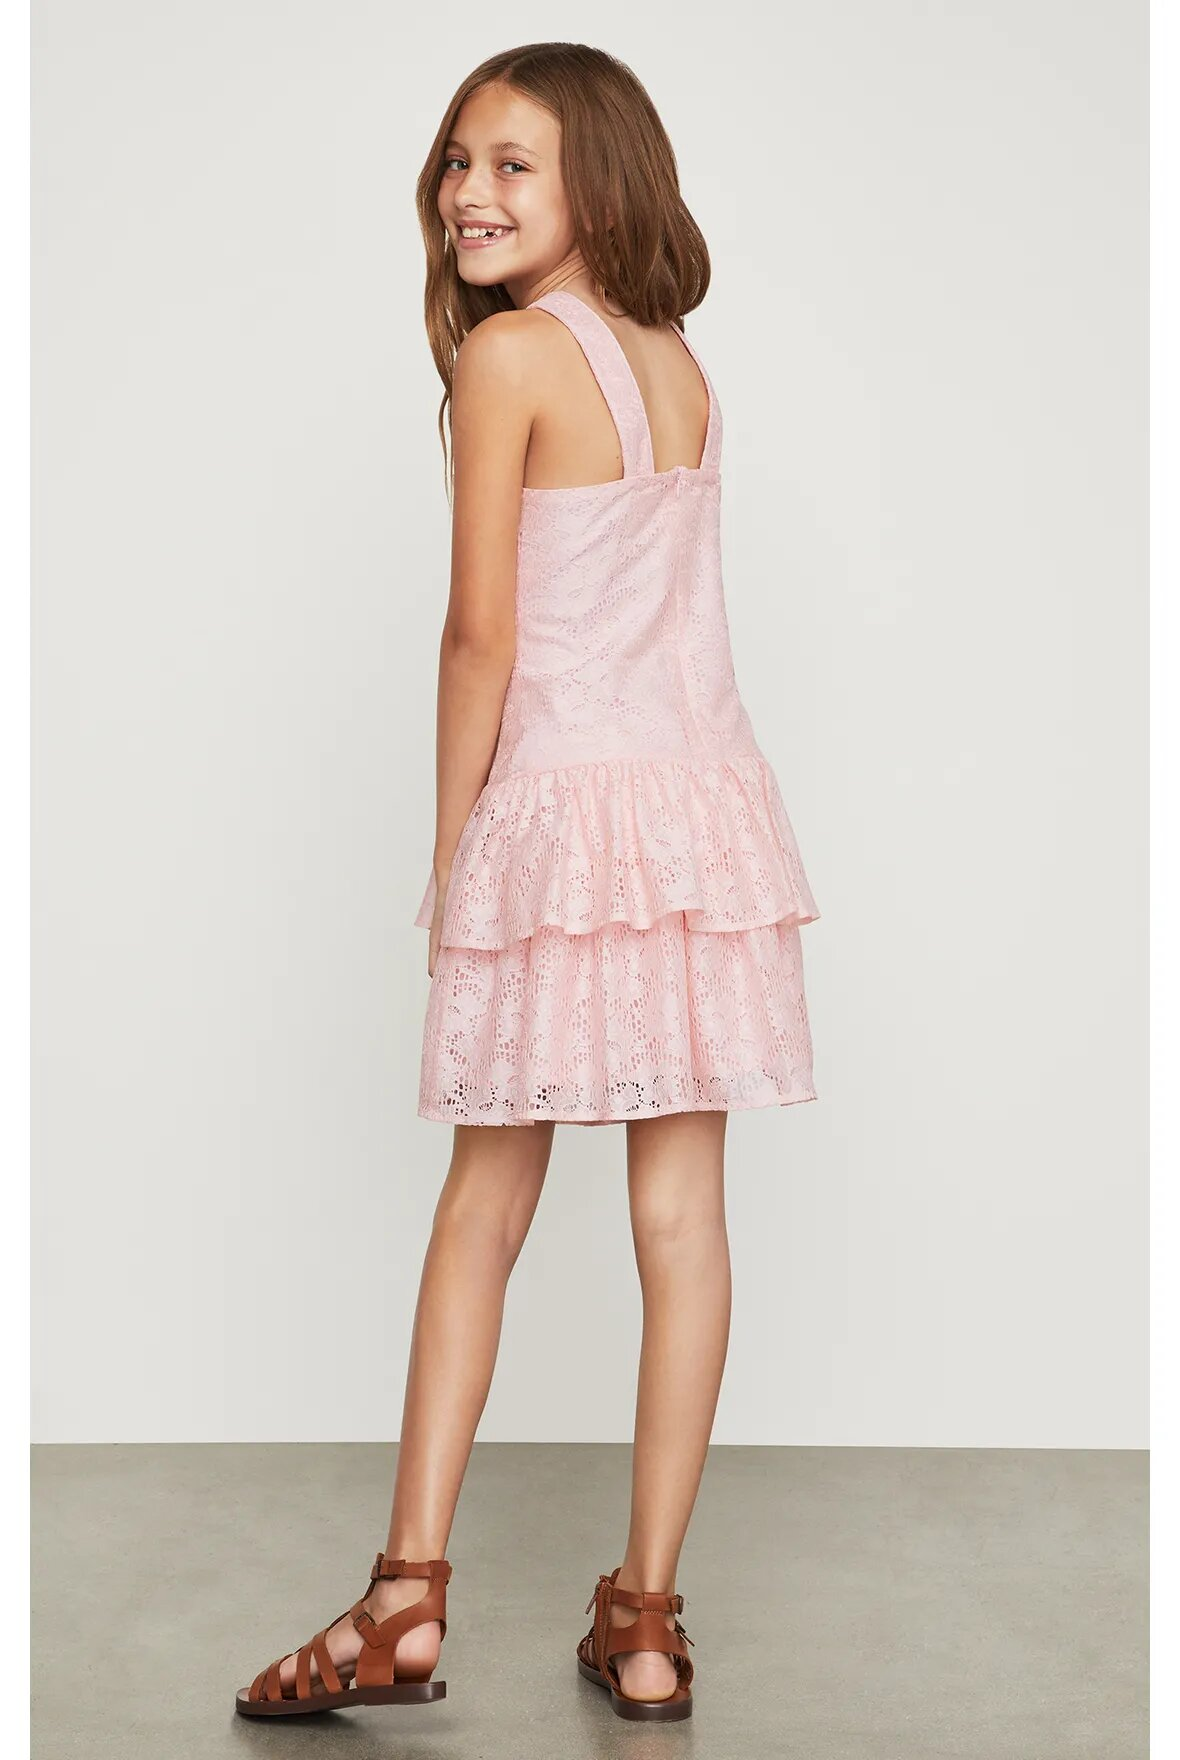 Vestido-halter-BCBGirls-rosa-claro-con-encaje-B838DR205_RPL_a